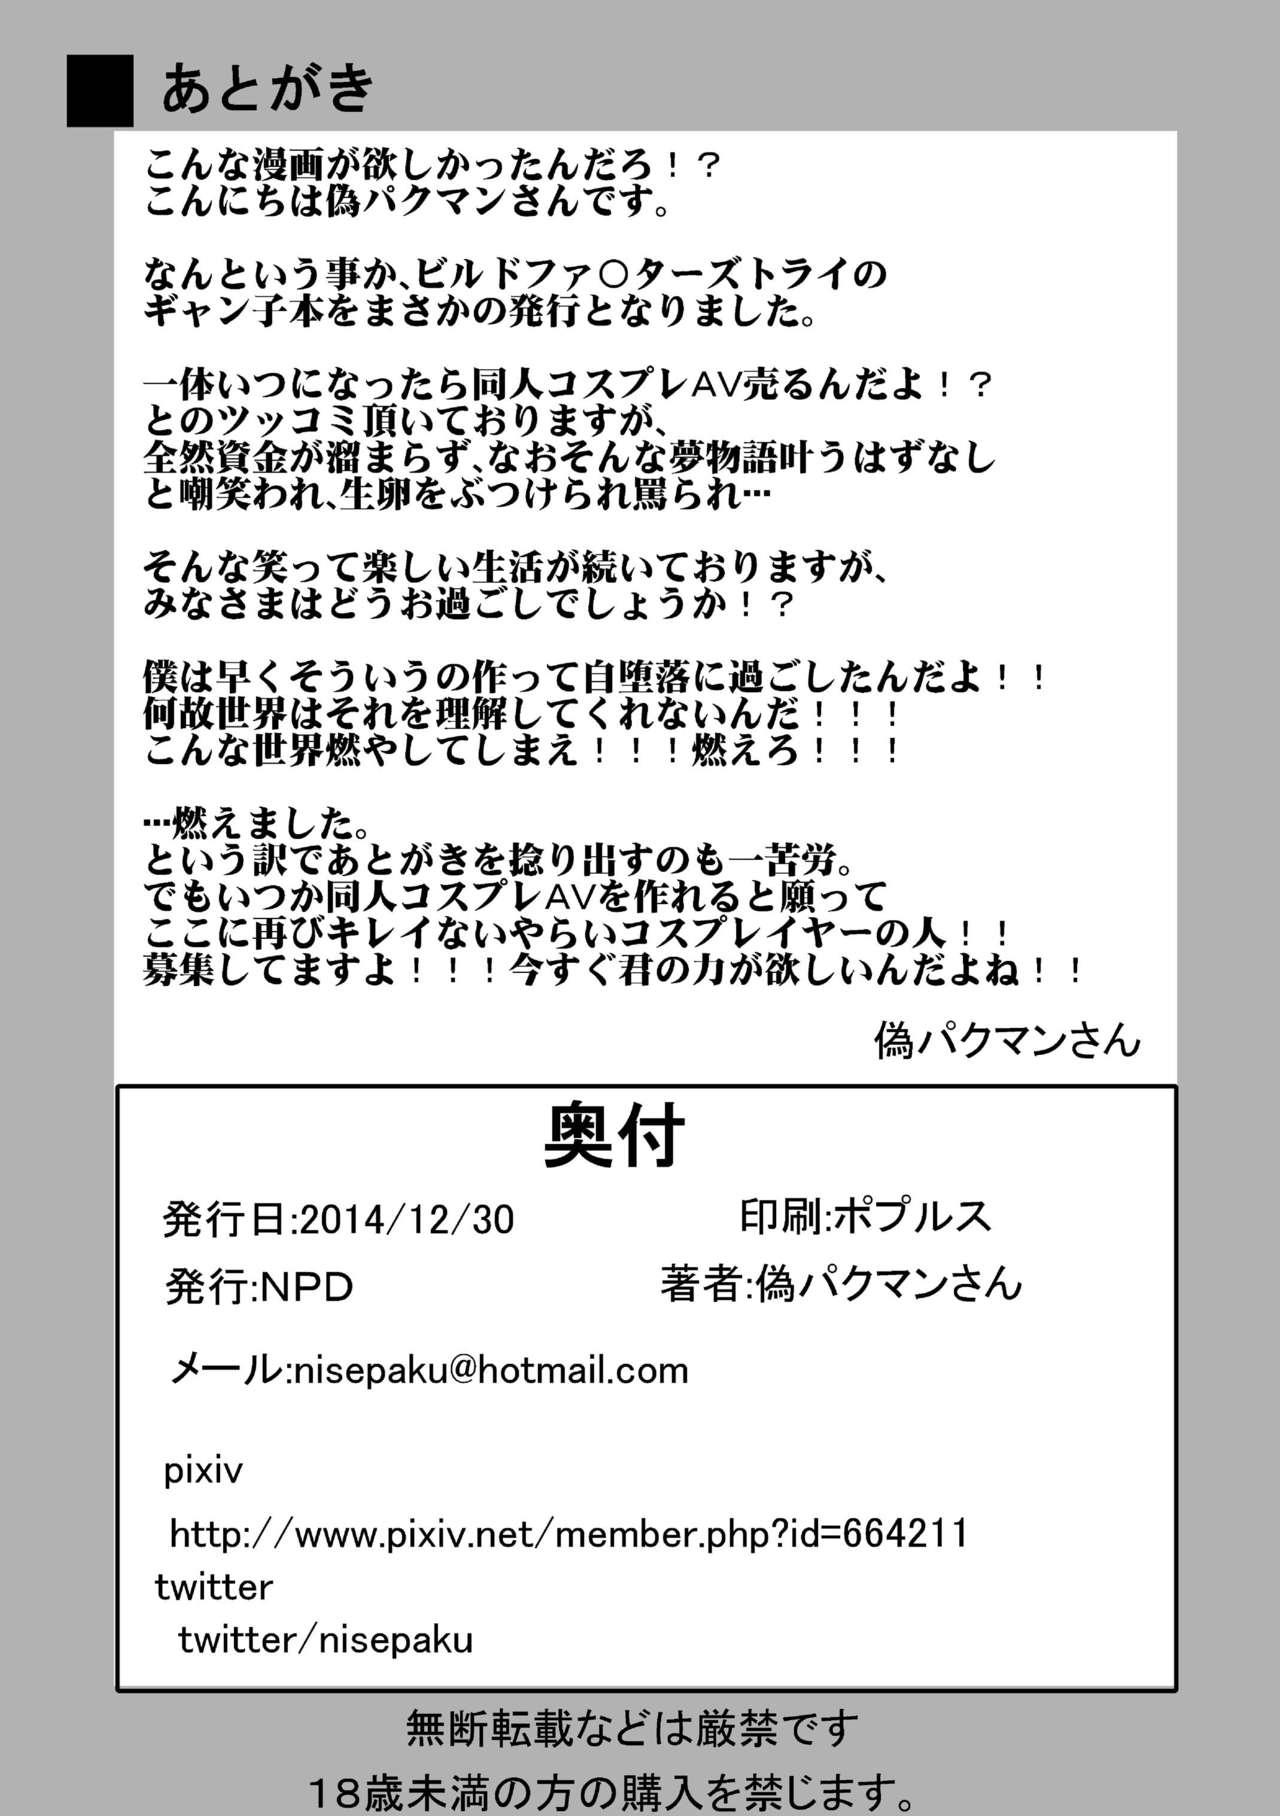 [Nisepakudo (Nisepakuman-san)] Plamo-kyou Chijo 3 -Futomashi- (Gundam Build Fighters Try) [Digital] 25